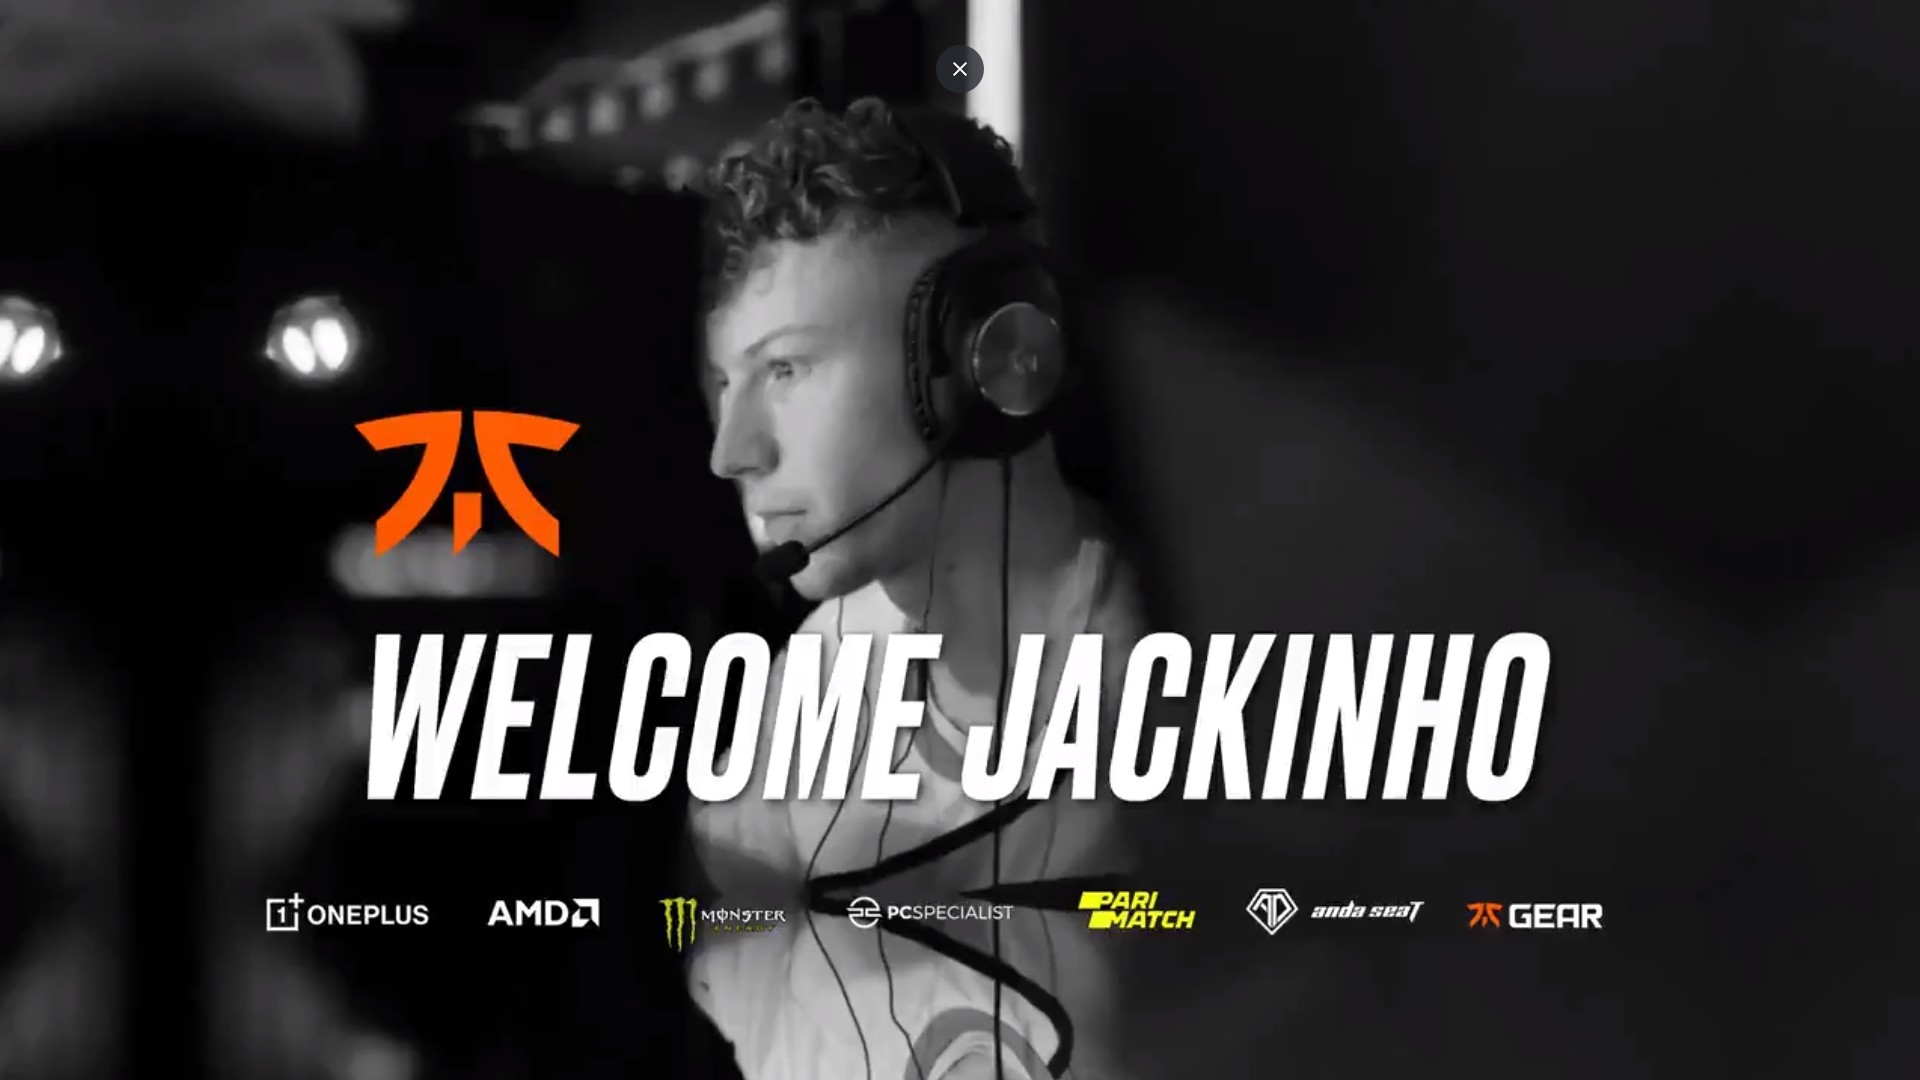 fnatic officialise Jackinho